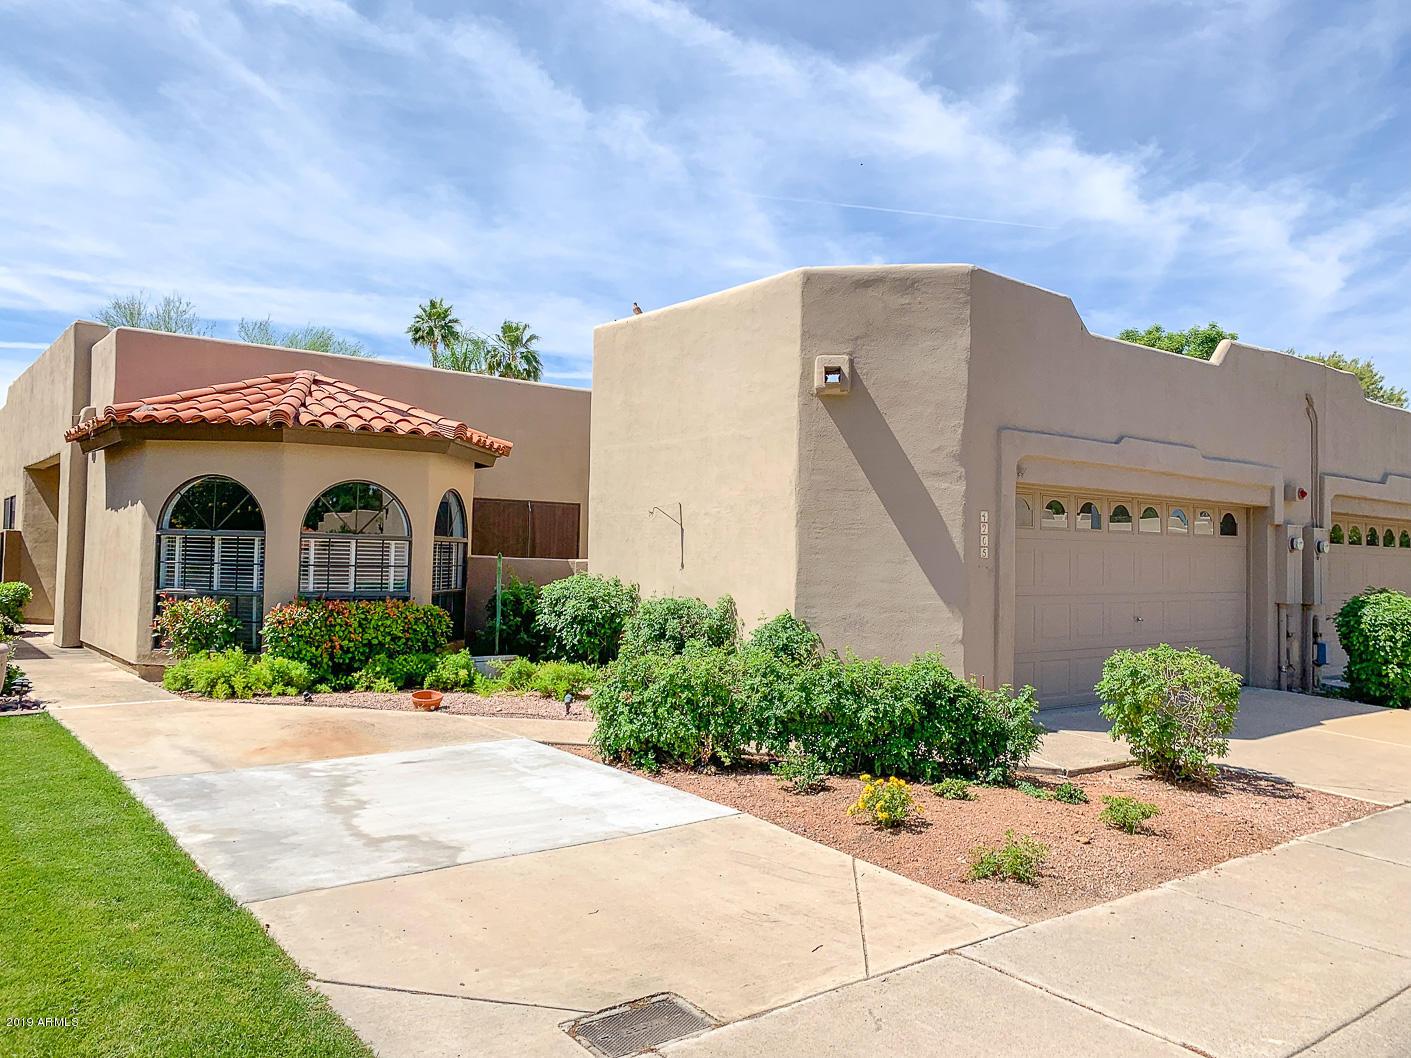 Photo of 4205 E Altadena Avenue, Phoenix, AZ 85028